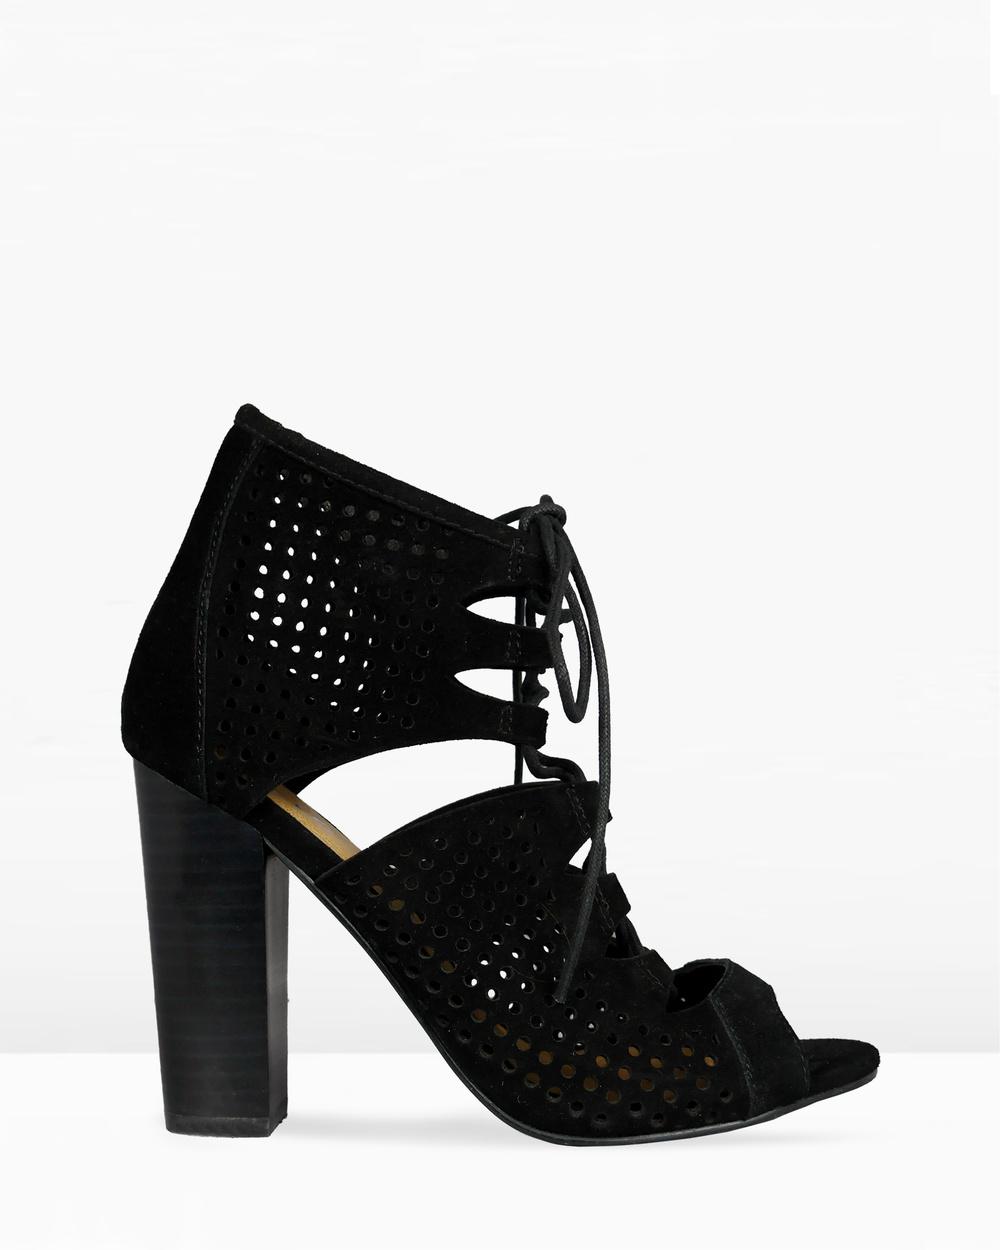 IRIS Footwear Kiara Heels Black Kiara